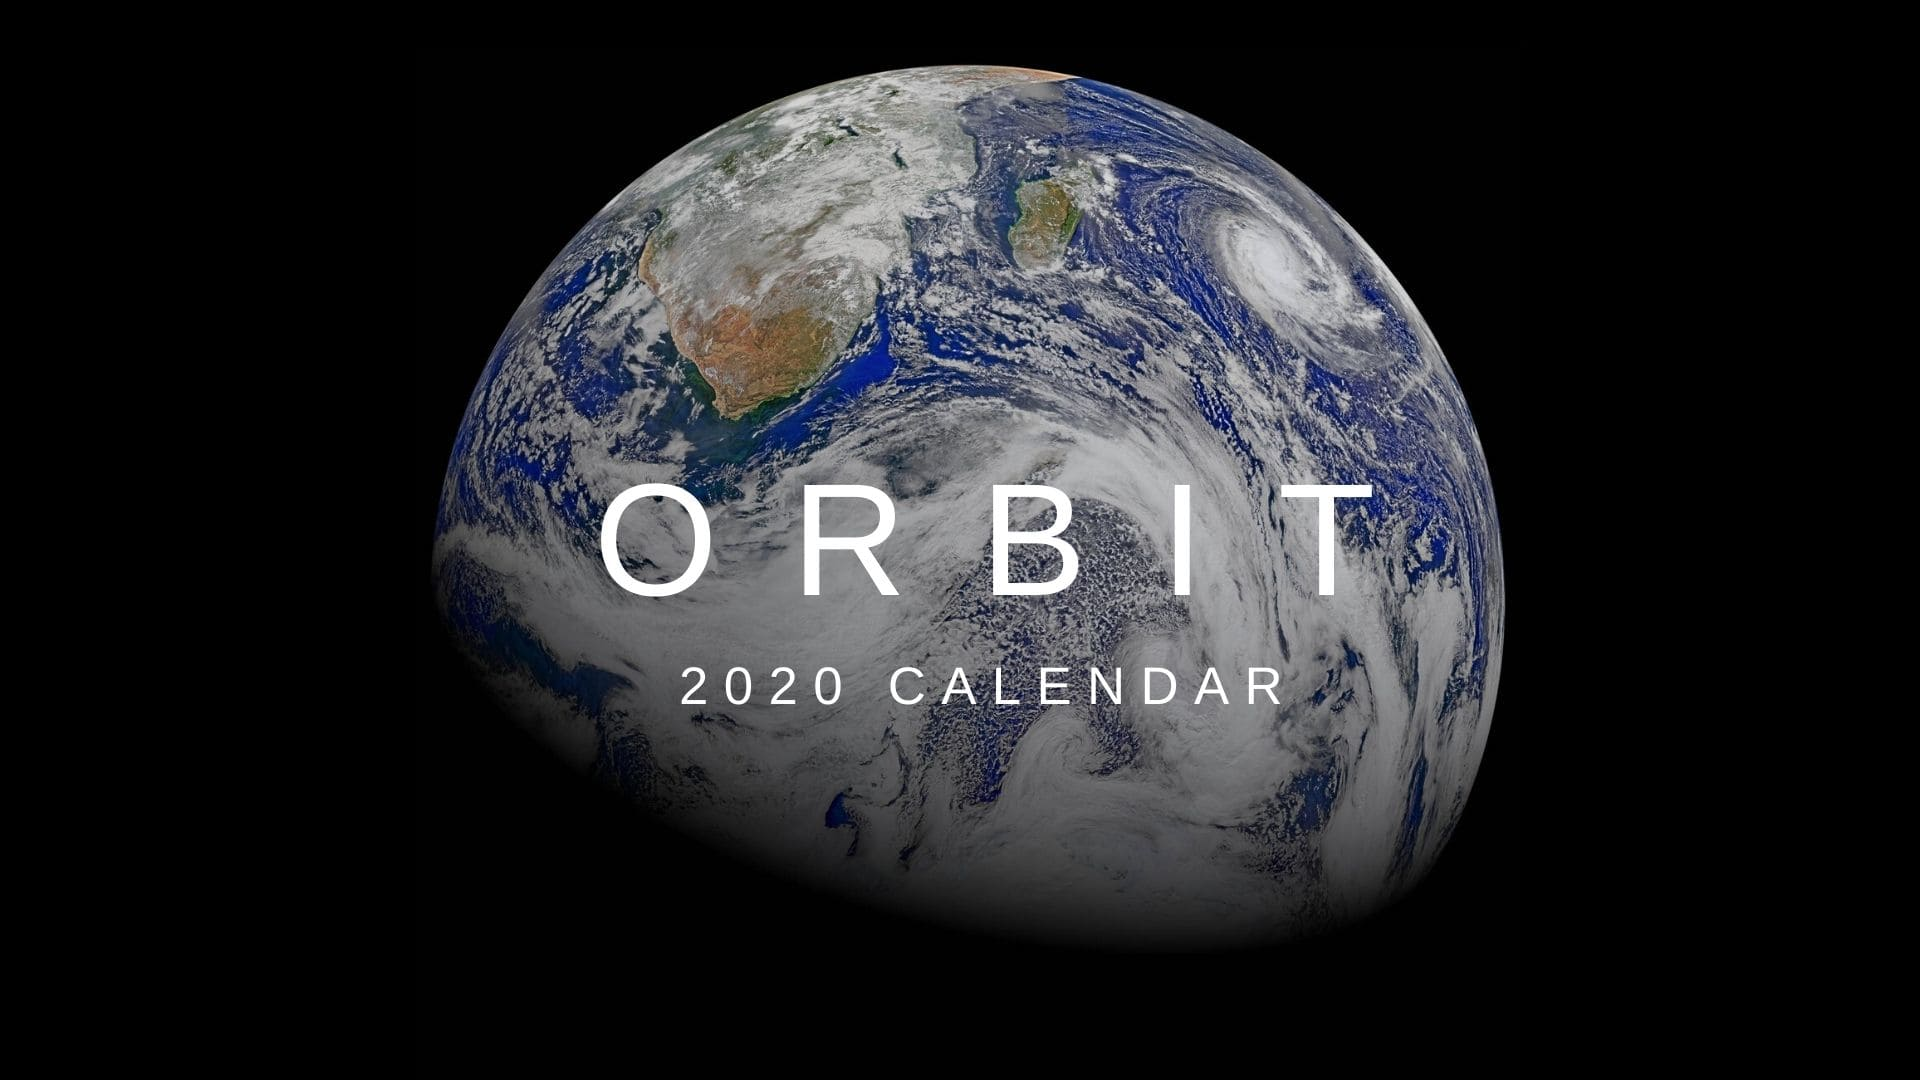 2020 space calendar